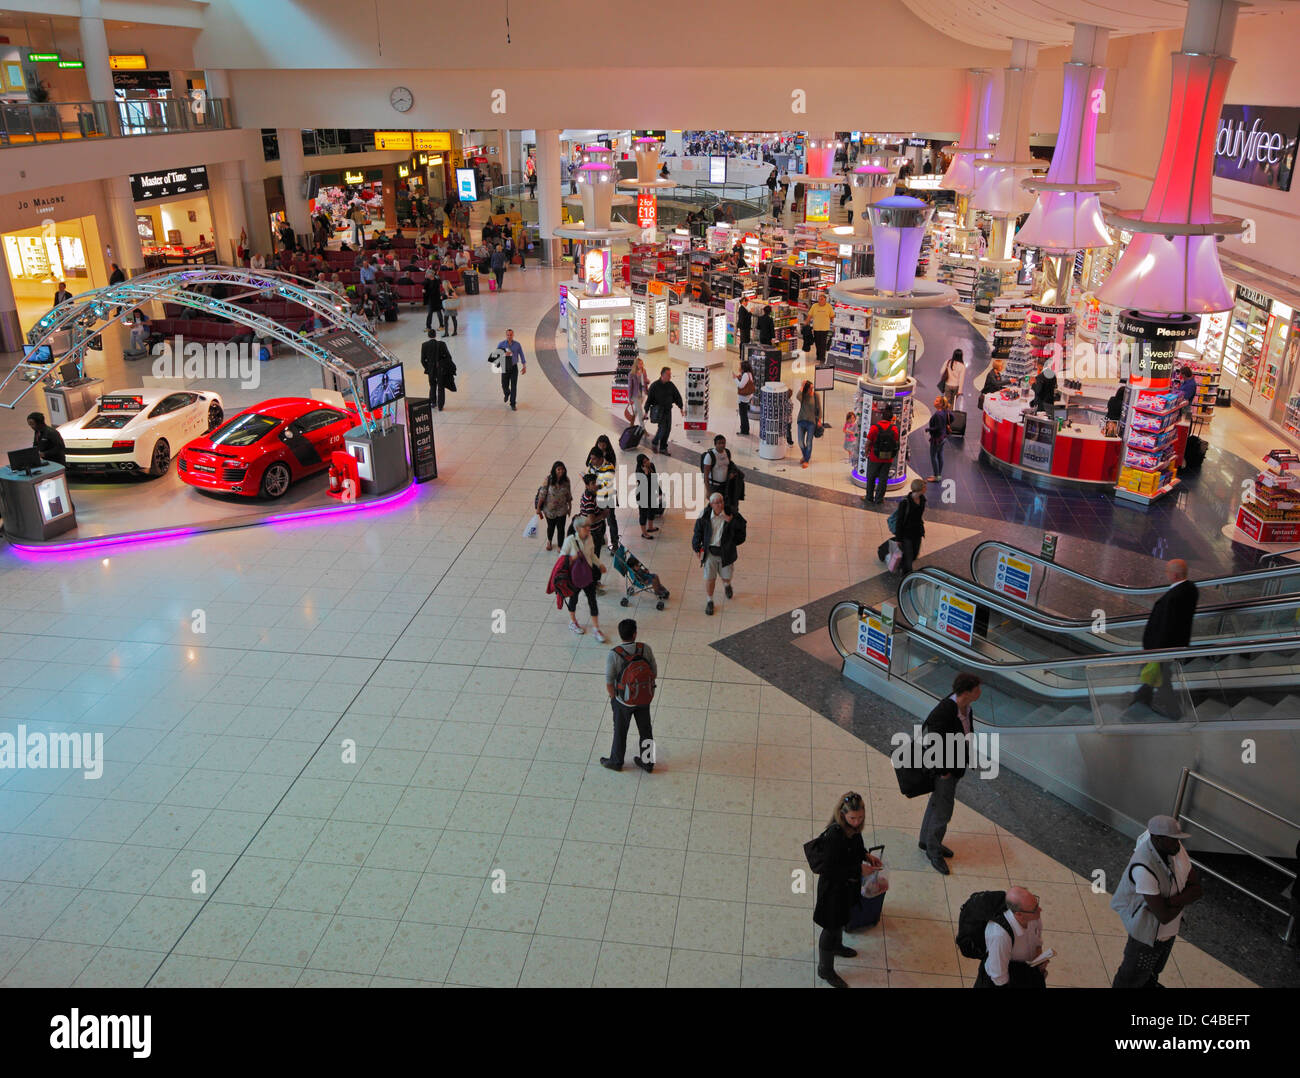 Gatwick Airport duty free shopping arcade. - Stock Image